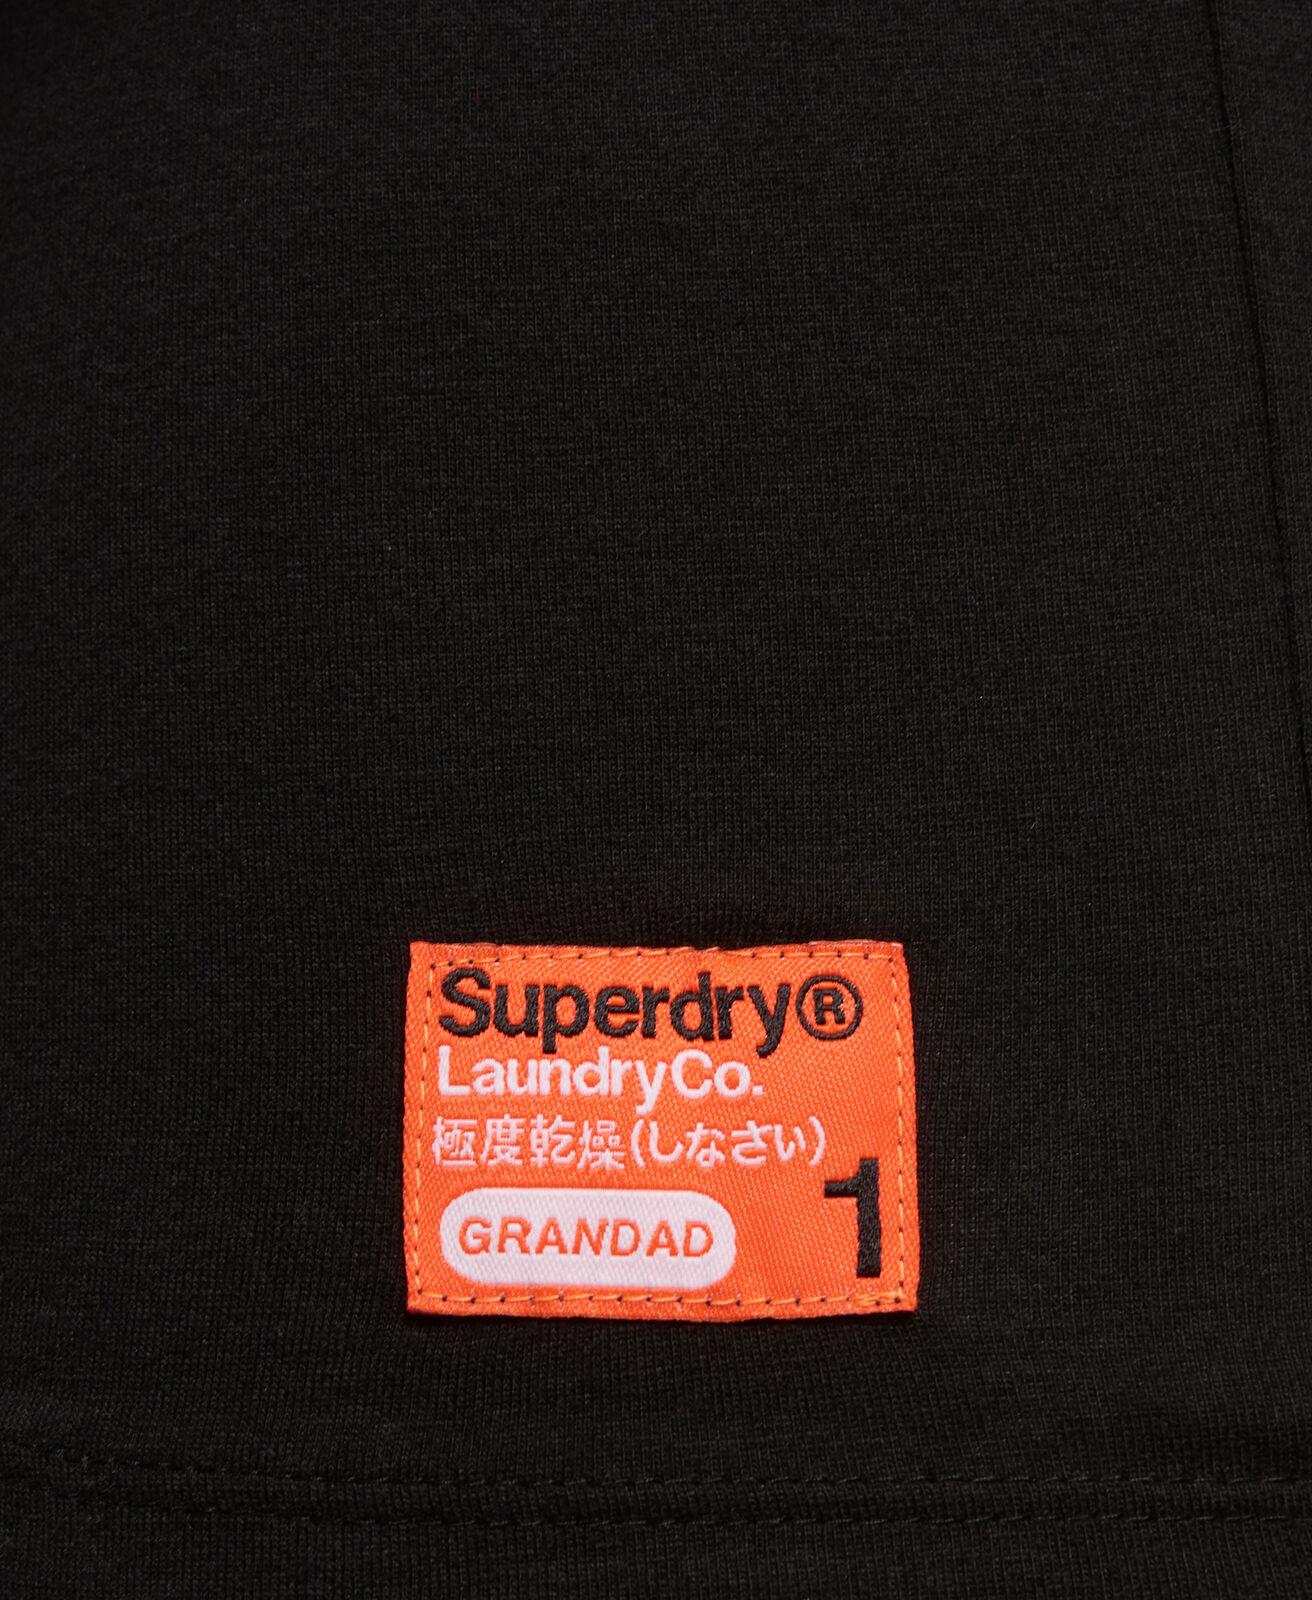 Mens-Superdry-Laundry-Organic-Cotton-Grandad-Top-Laundry-Black thumbnail 12